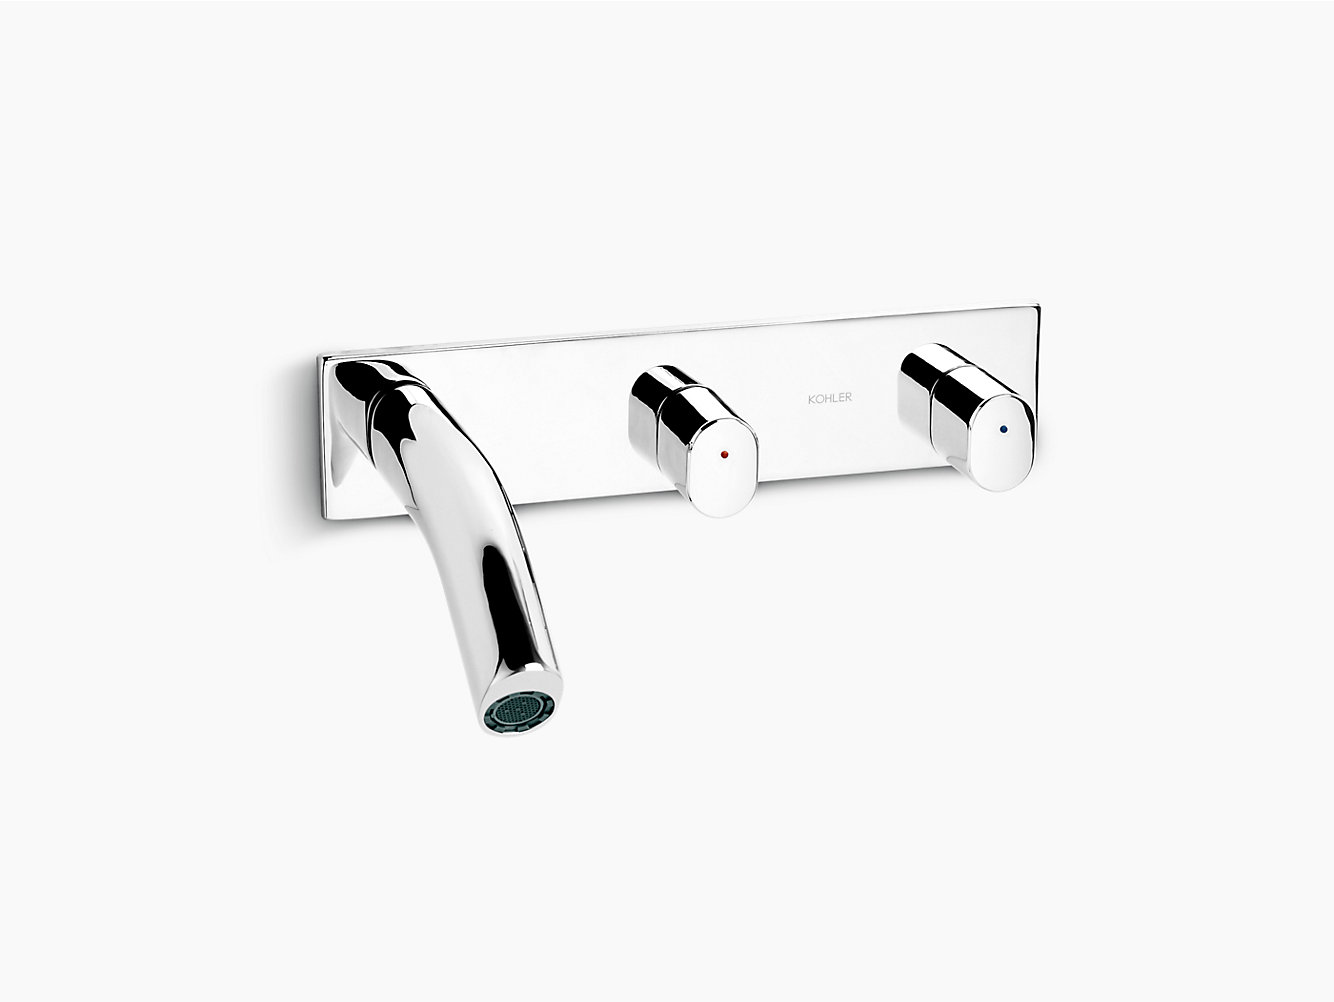 Oblo Wall-Mount Lavatory Faucet | 10087T-9 | KOHLER